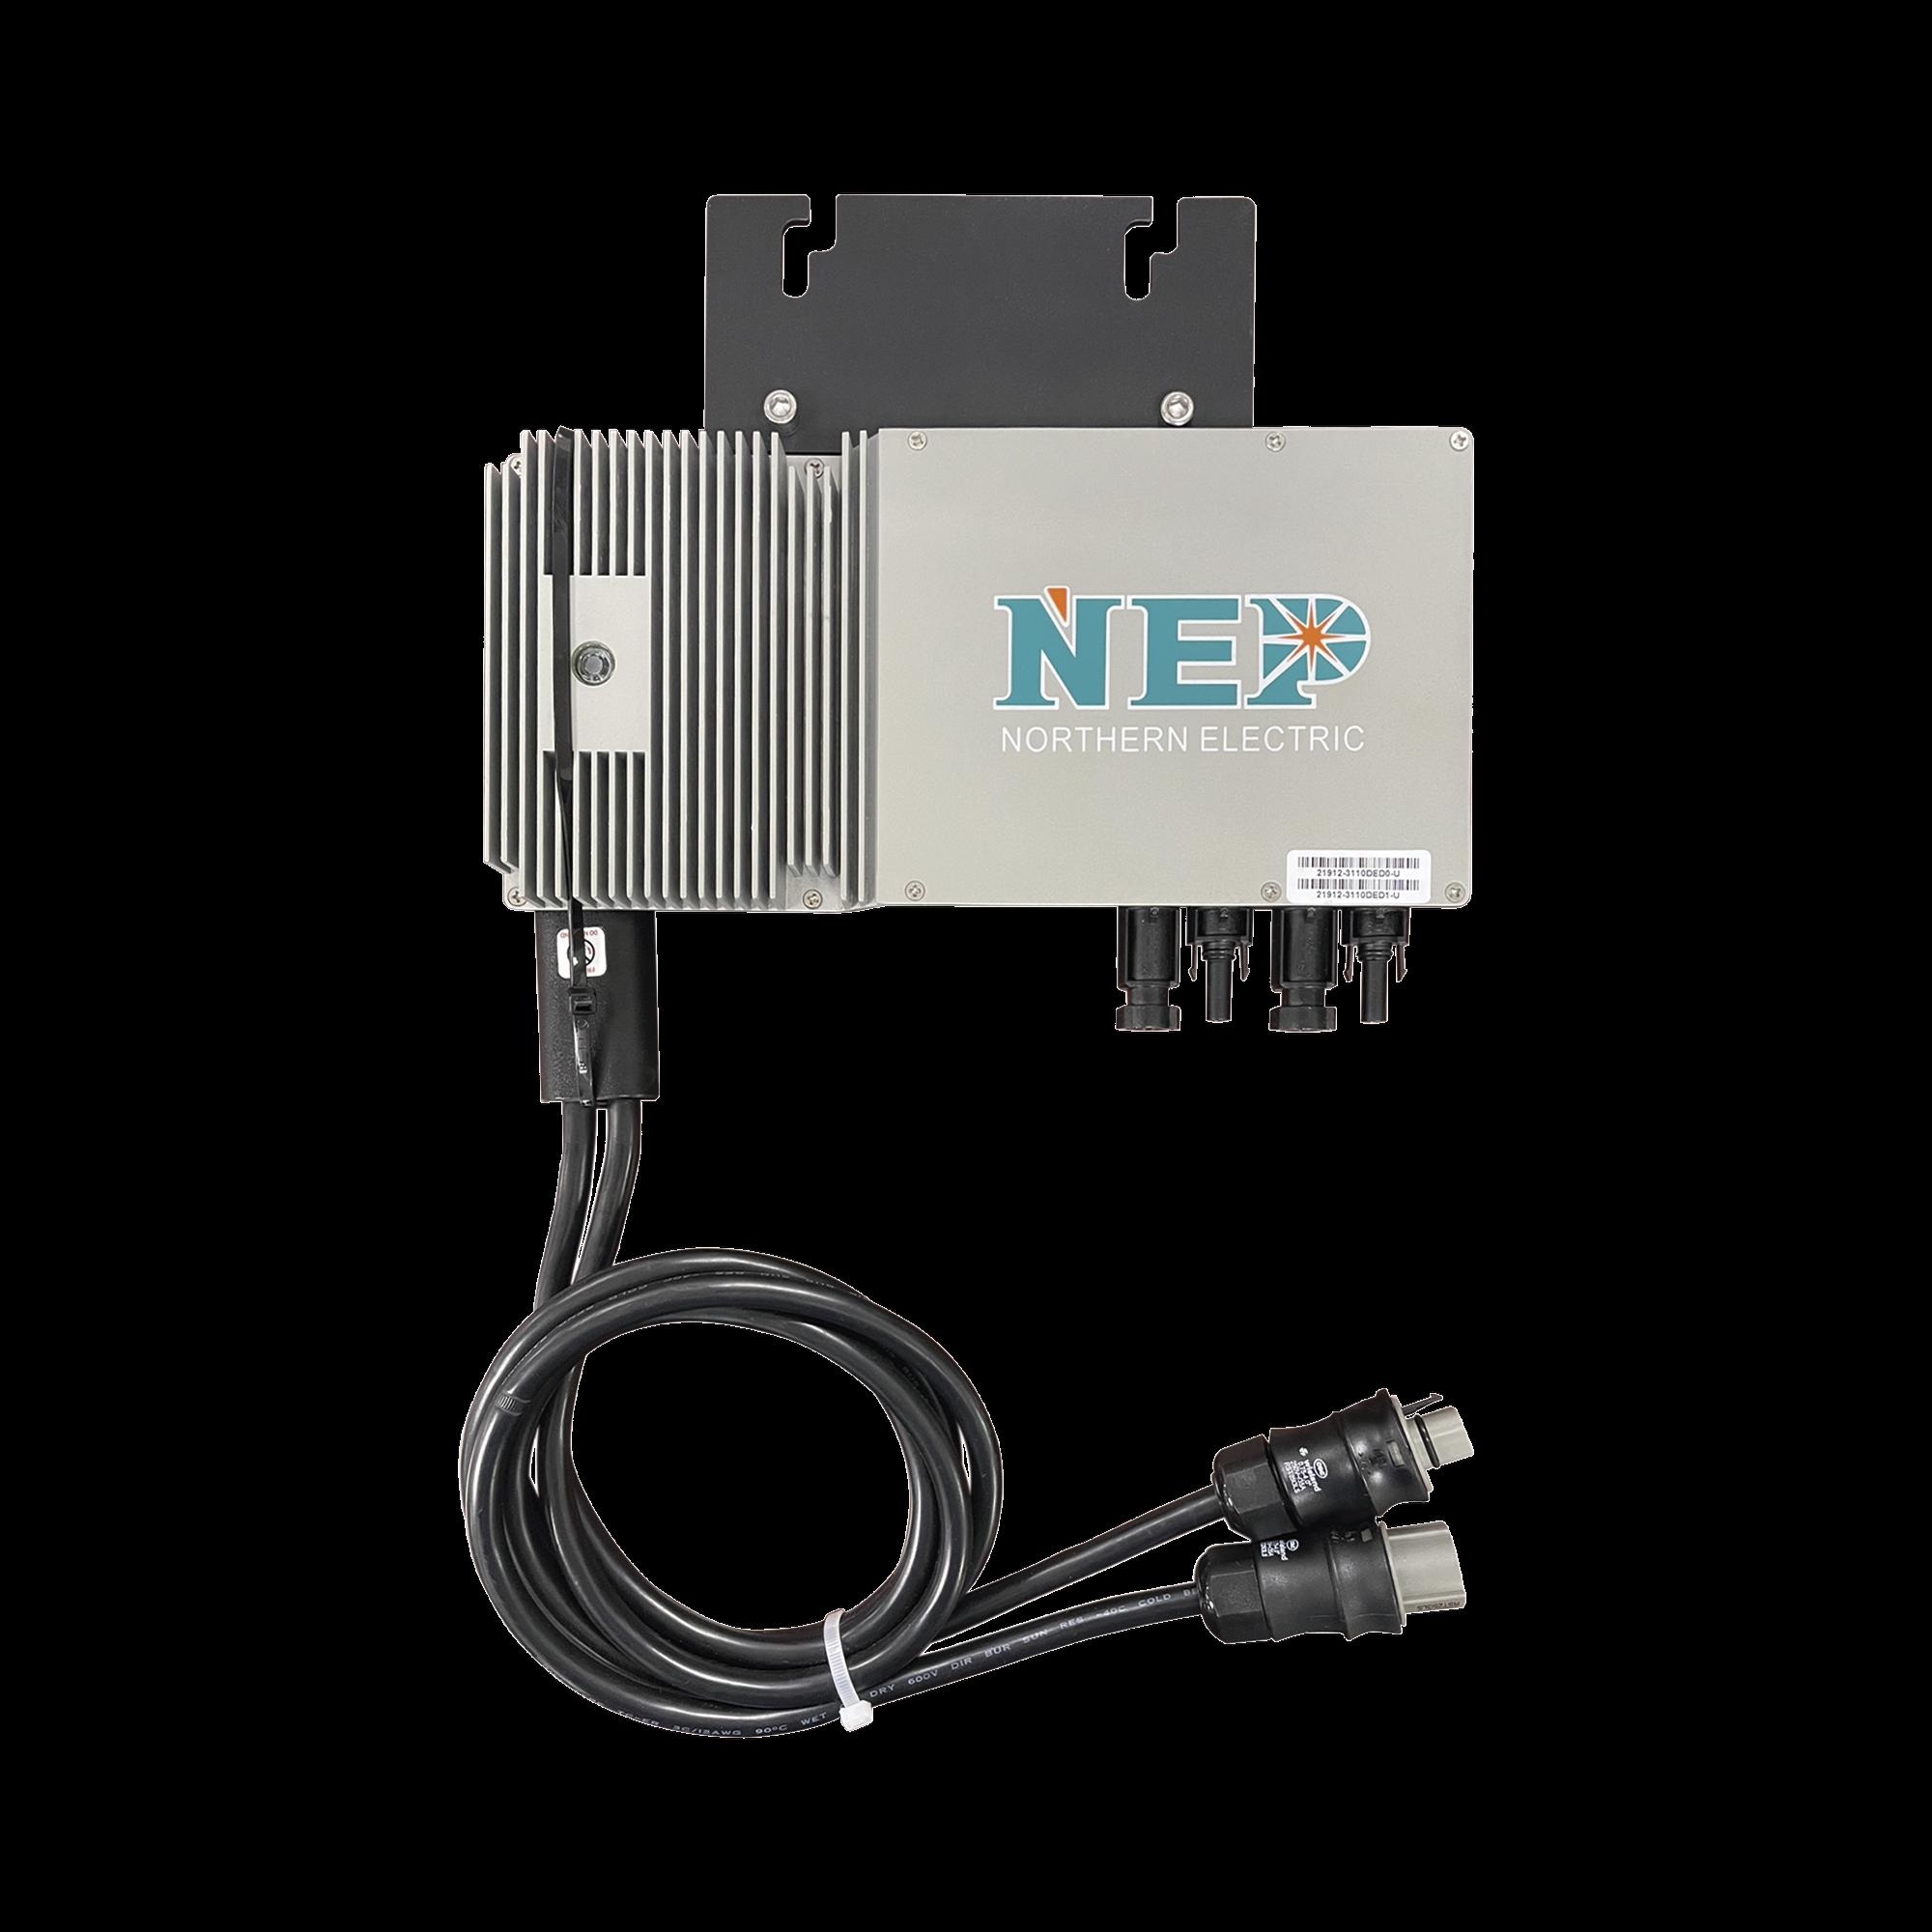 Microinversor 600 W para Interconexión a Red Eléctrica 220V, IP67 Con Cable Troncal Incluido